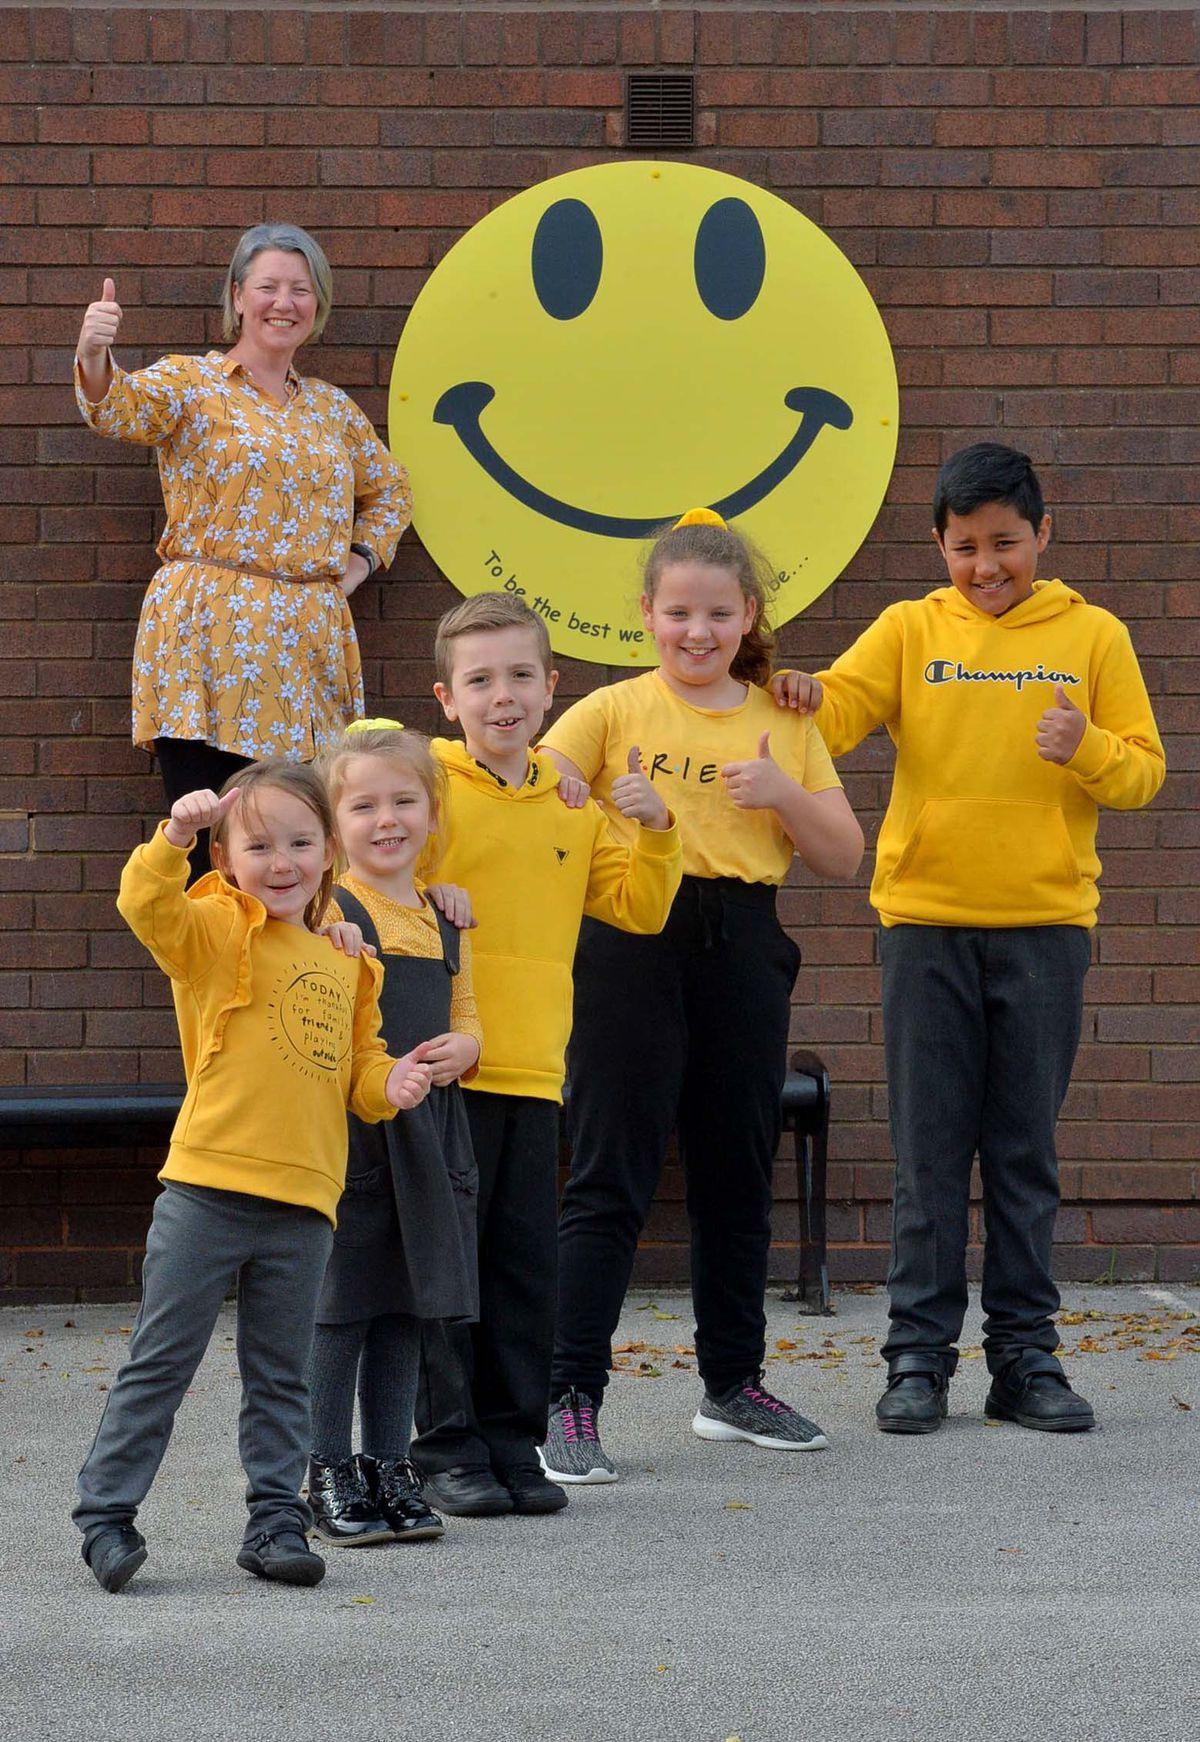 Life coach Nicki Hamilton with pupils Lilly Winsper, 5, Emilyn Leach, 4, Charlie Morris, 8, Grace Lloyd, 9, and Avi Bal, 11